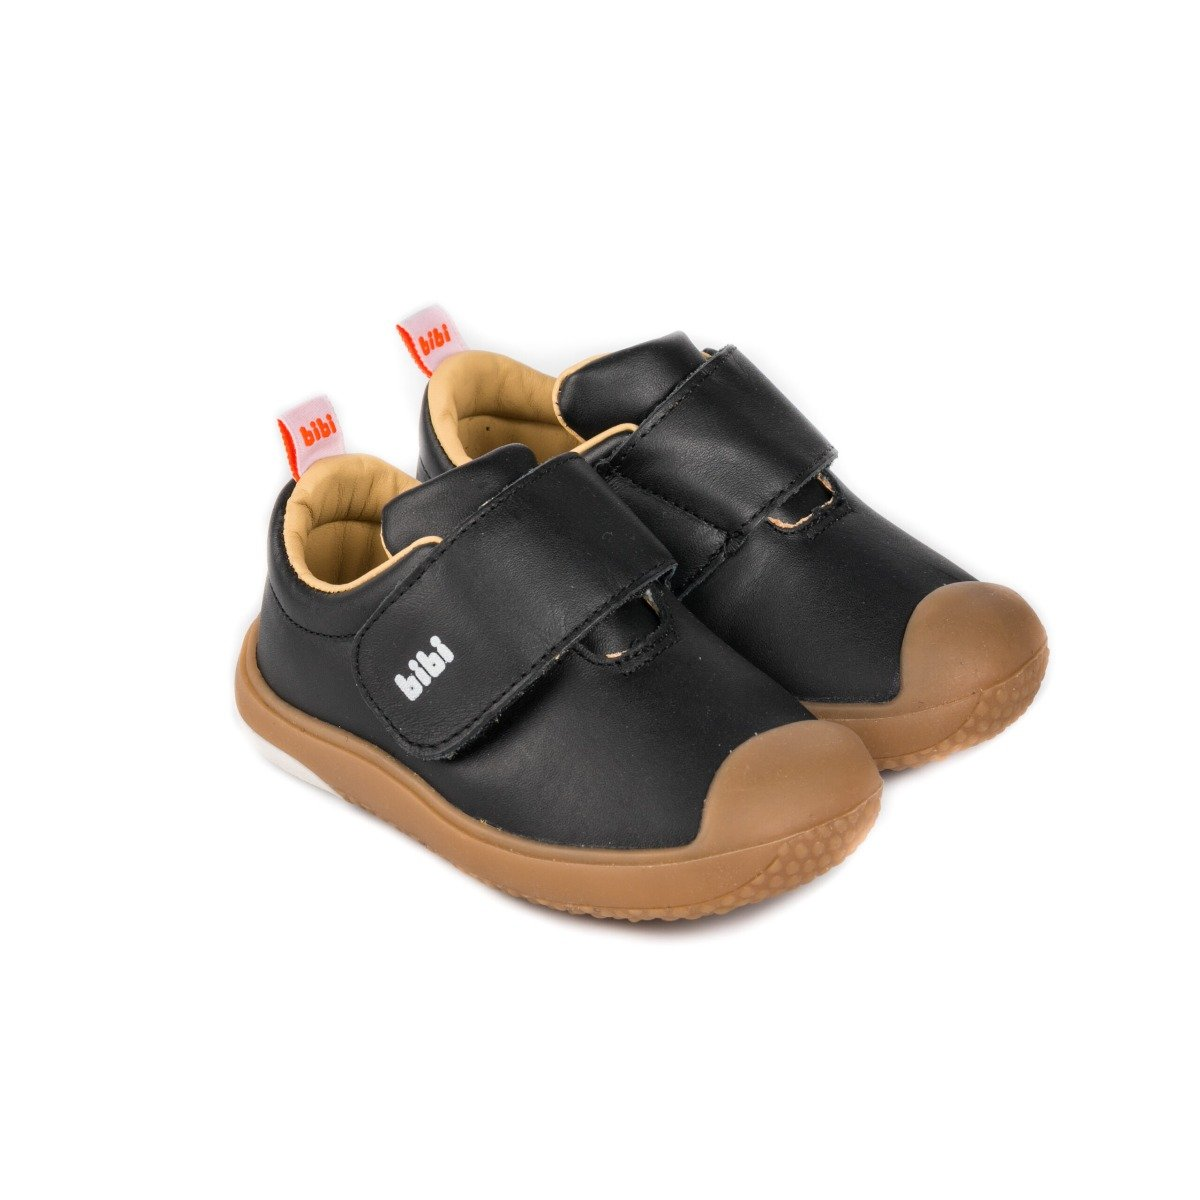 Pantofi sport Bibi Shoes Prewalker, Negru imagine